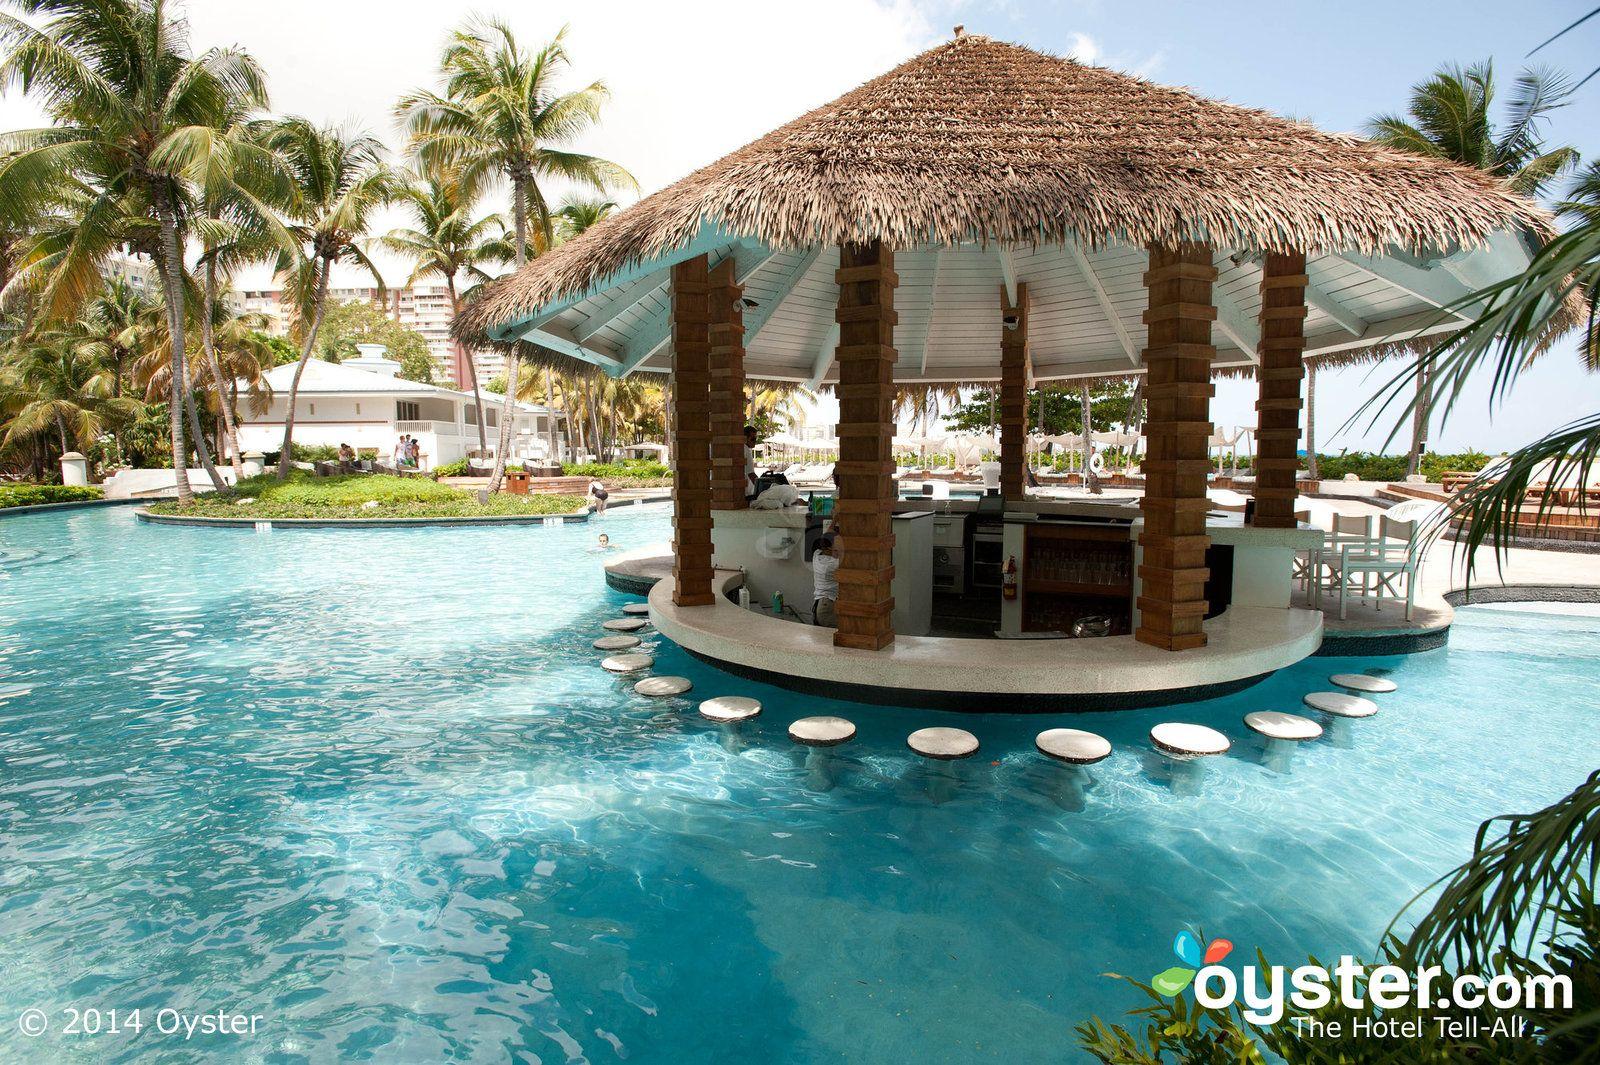 Pool Bar At The El San Juan Hotel And Isla Verde Puerto Rico